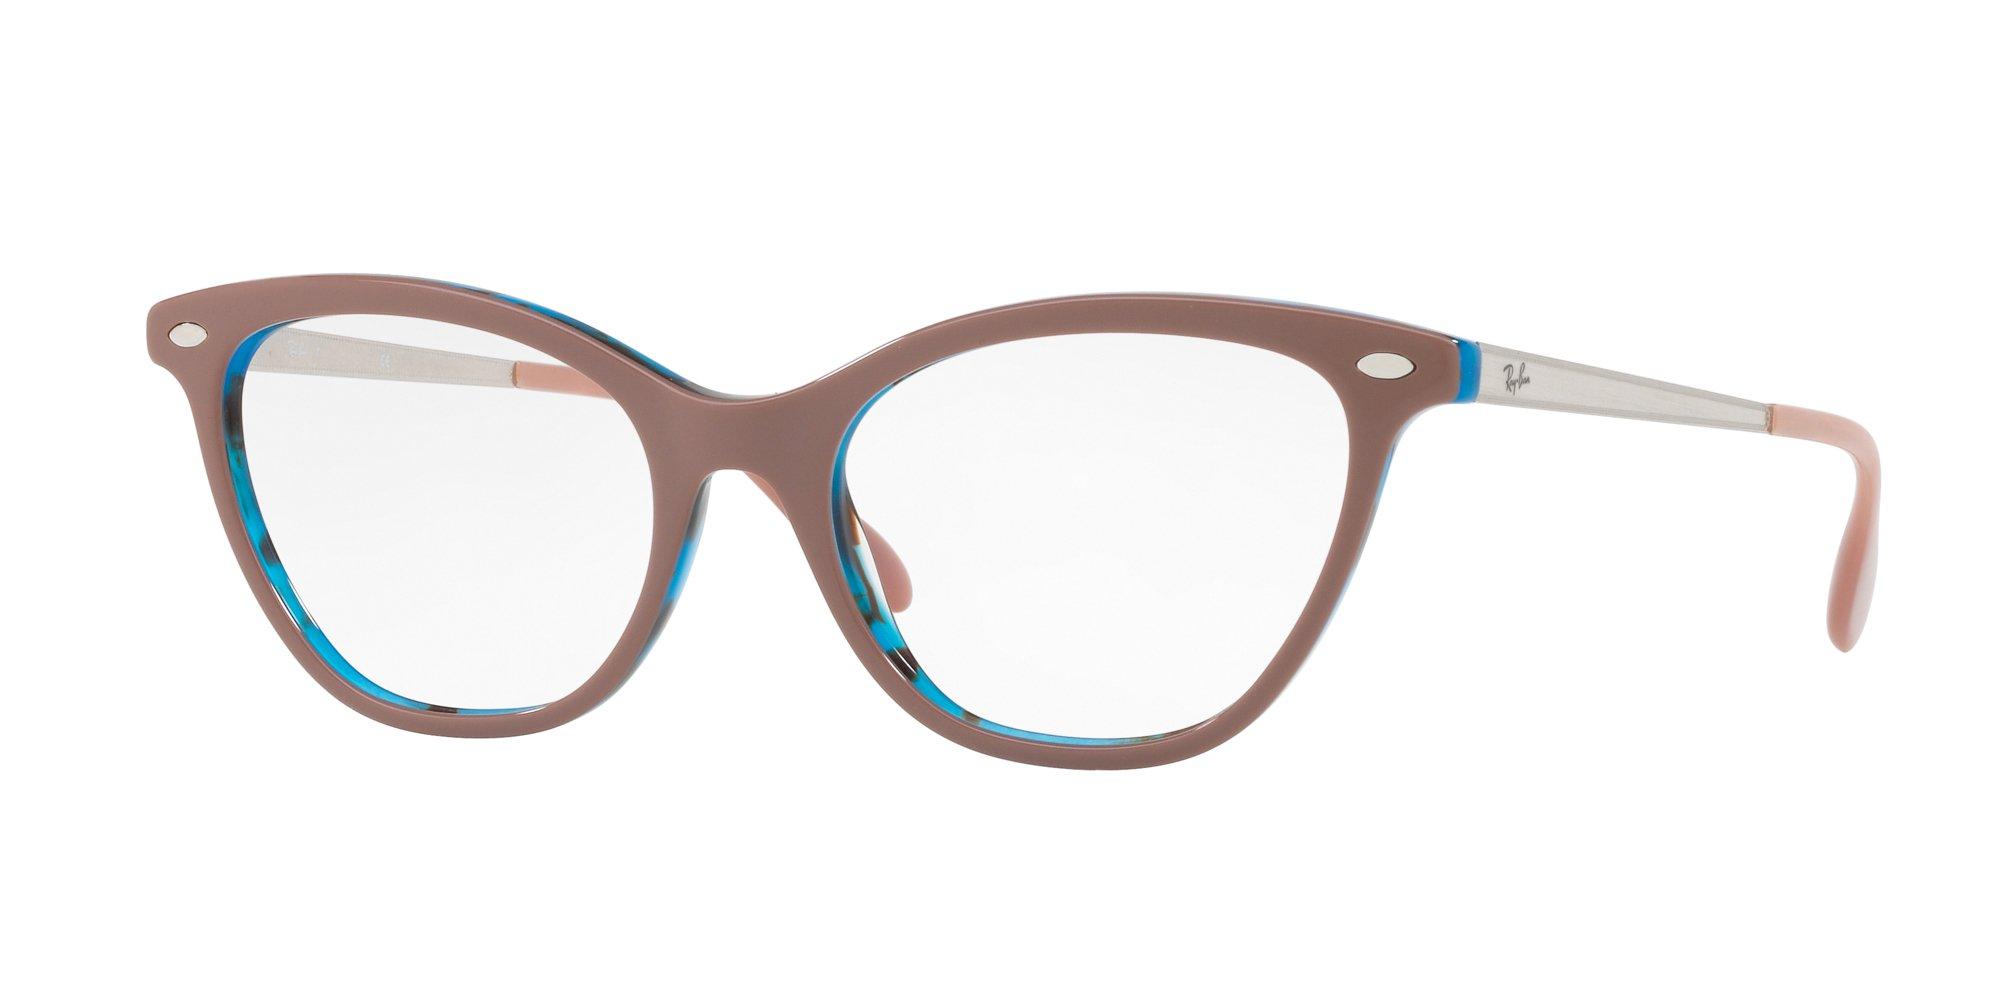 Ray-Ban Women's RX5360 Eyeglasses Top Light Brown On Havana Blue 52mm